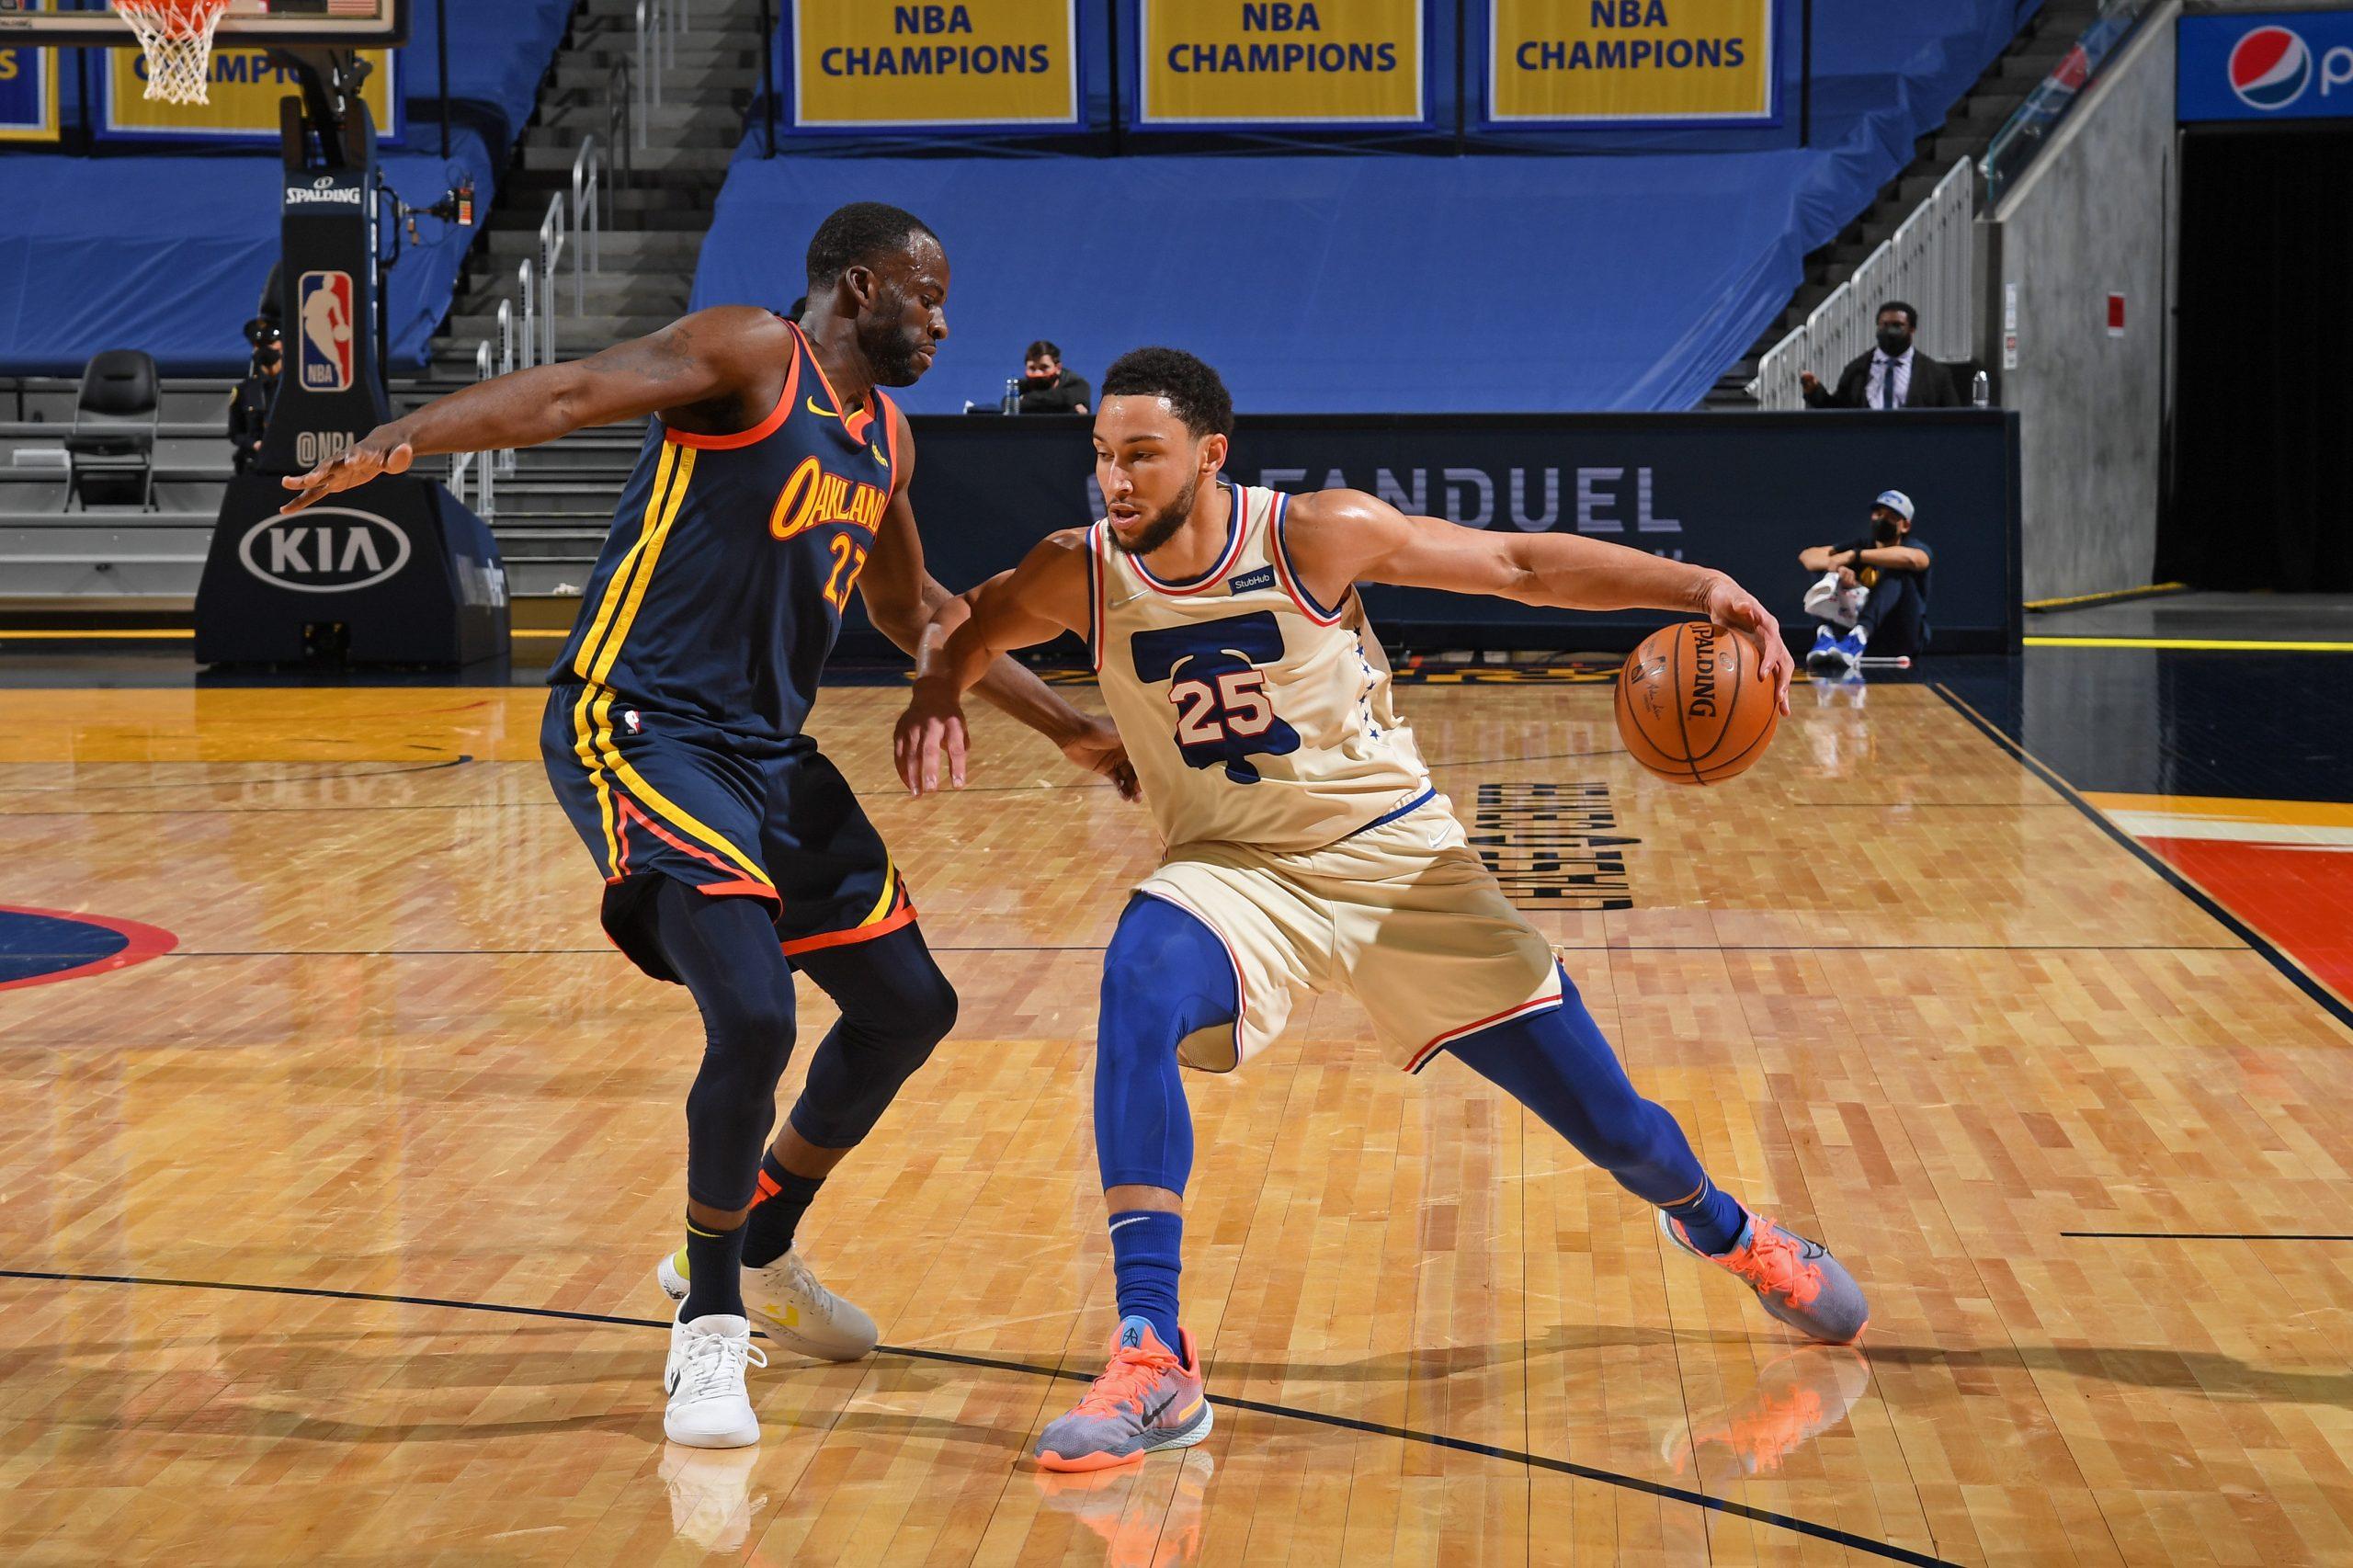 Suns w Finale Konferencji, kontuzja Irvinga, Jokic stracił nerwy